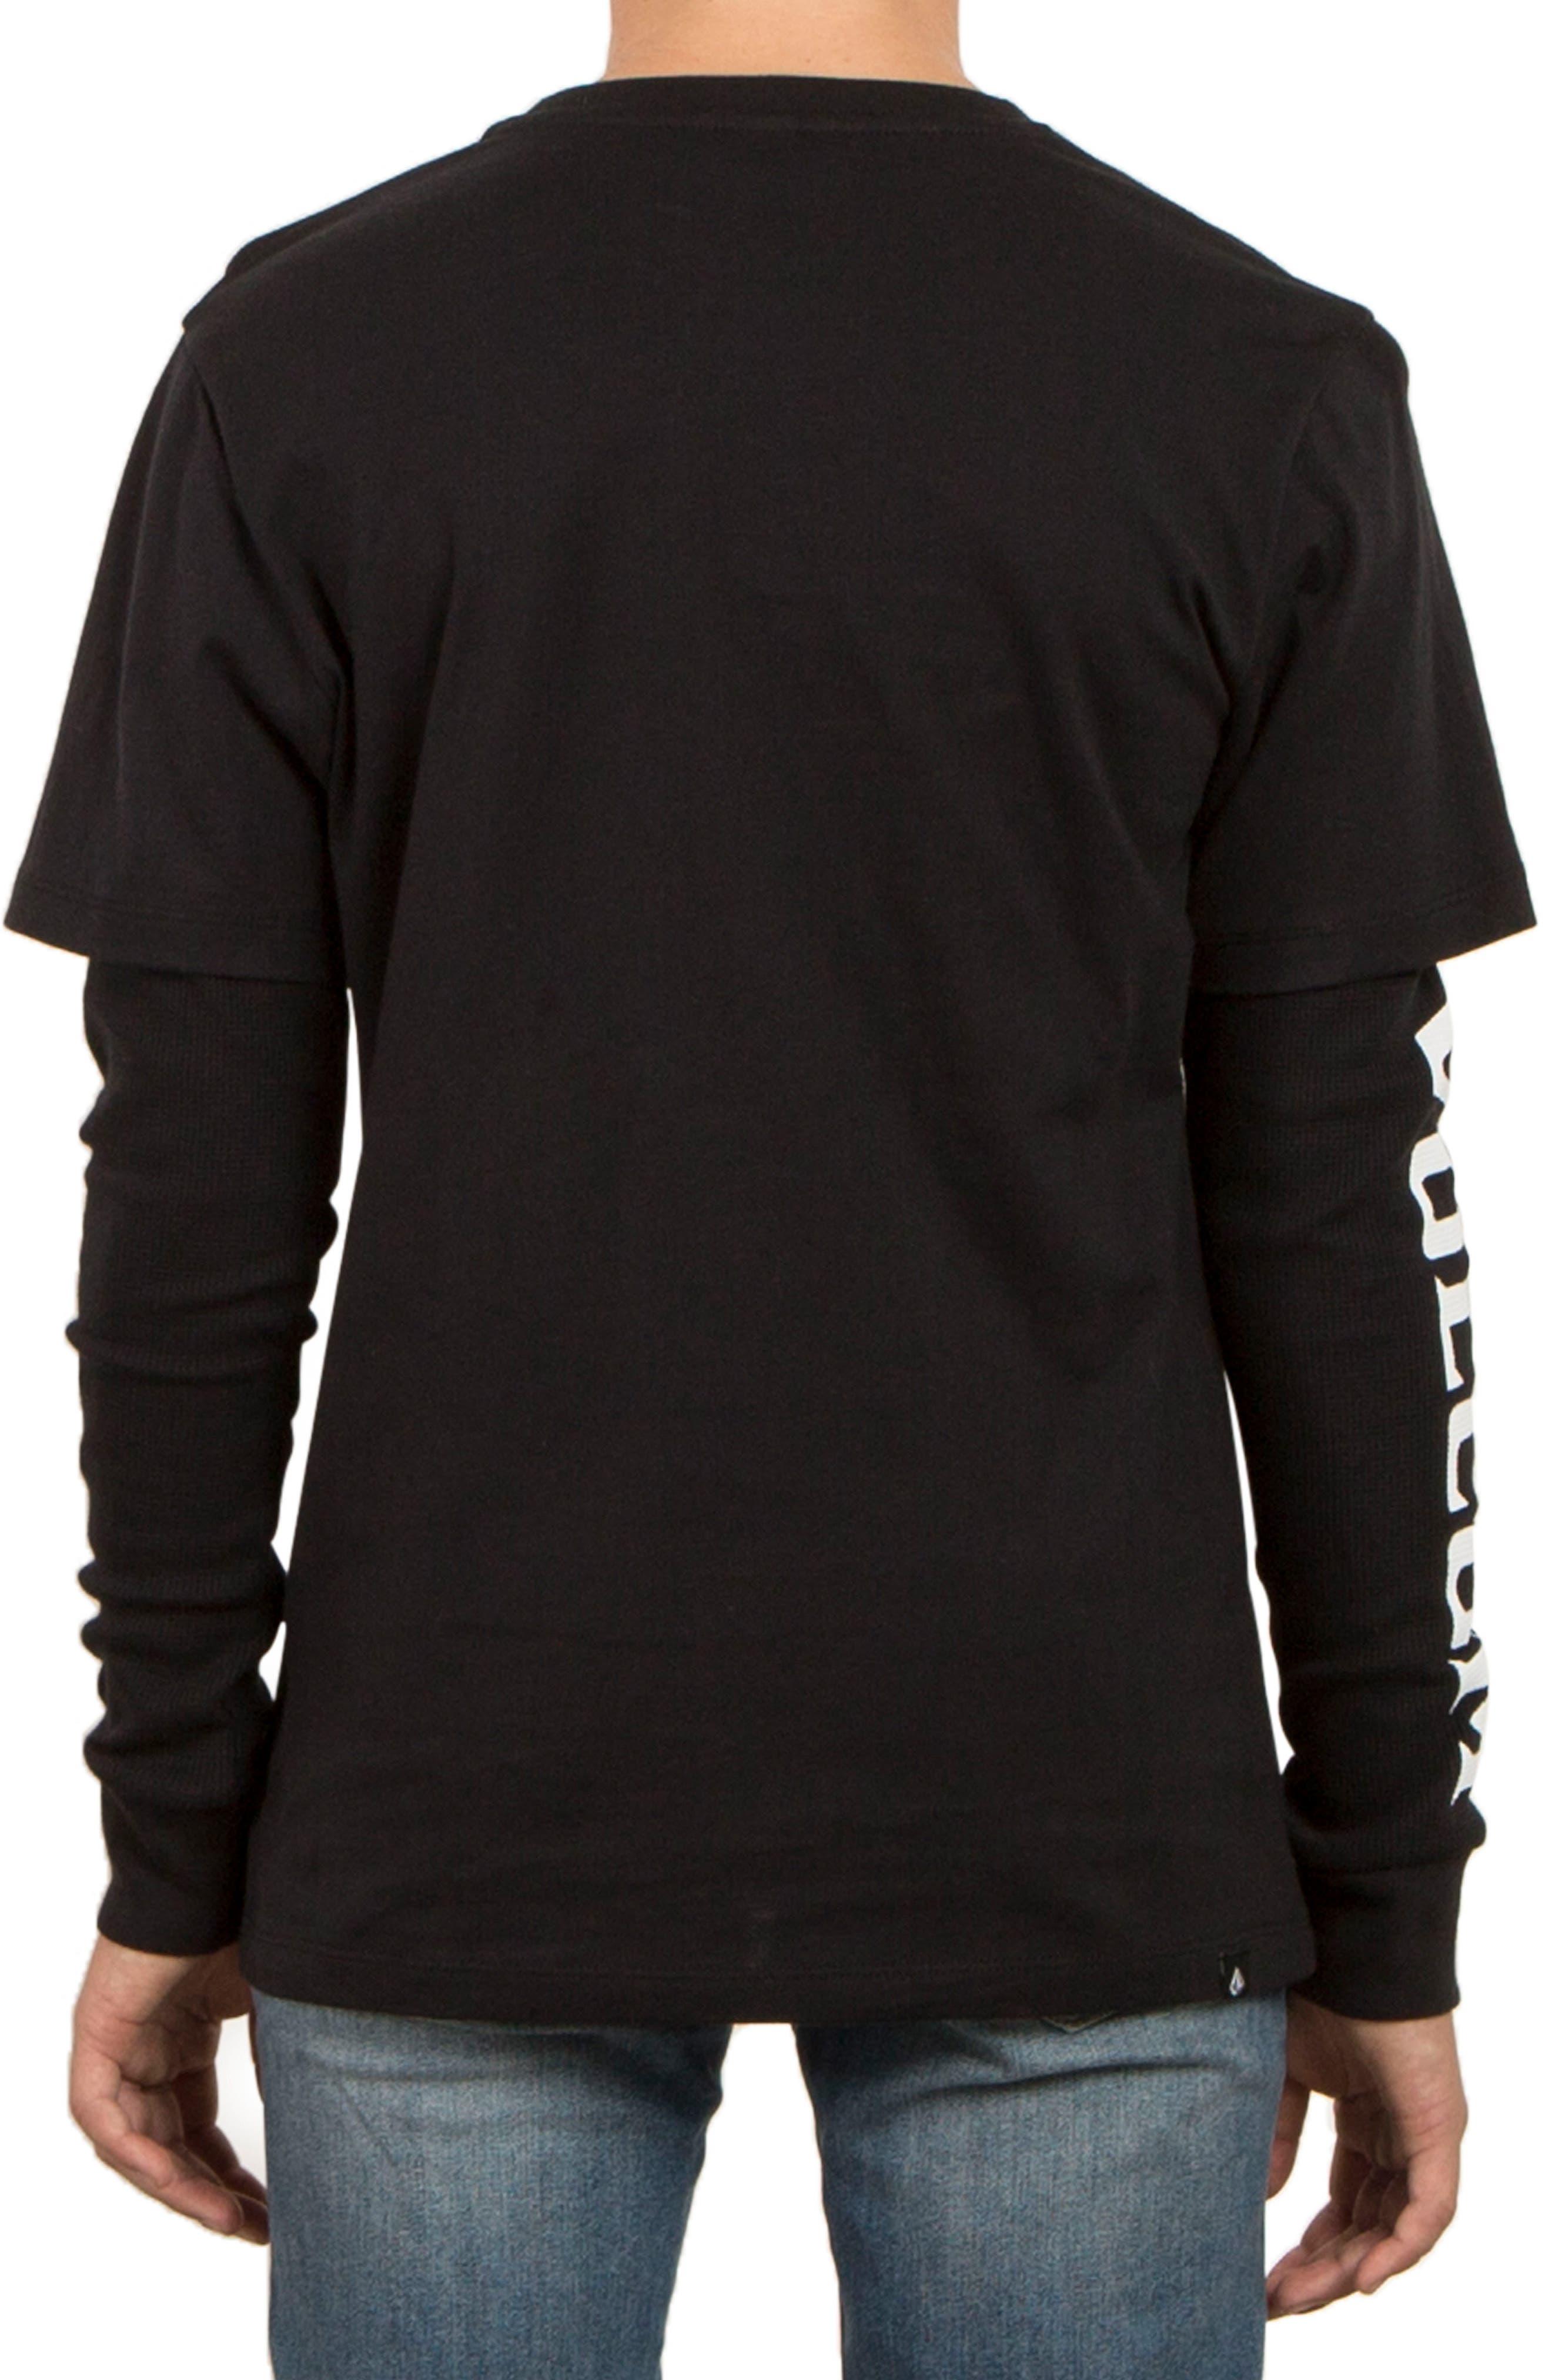 Easton Long Sleeve T-Shirt,                             Alternate thumbnail 2, color,                             001